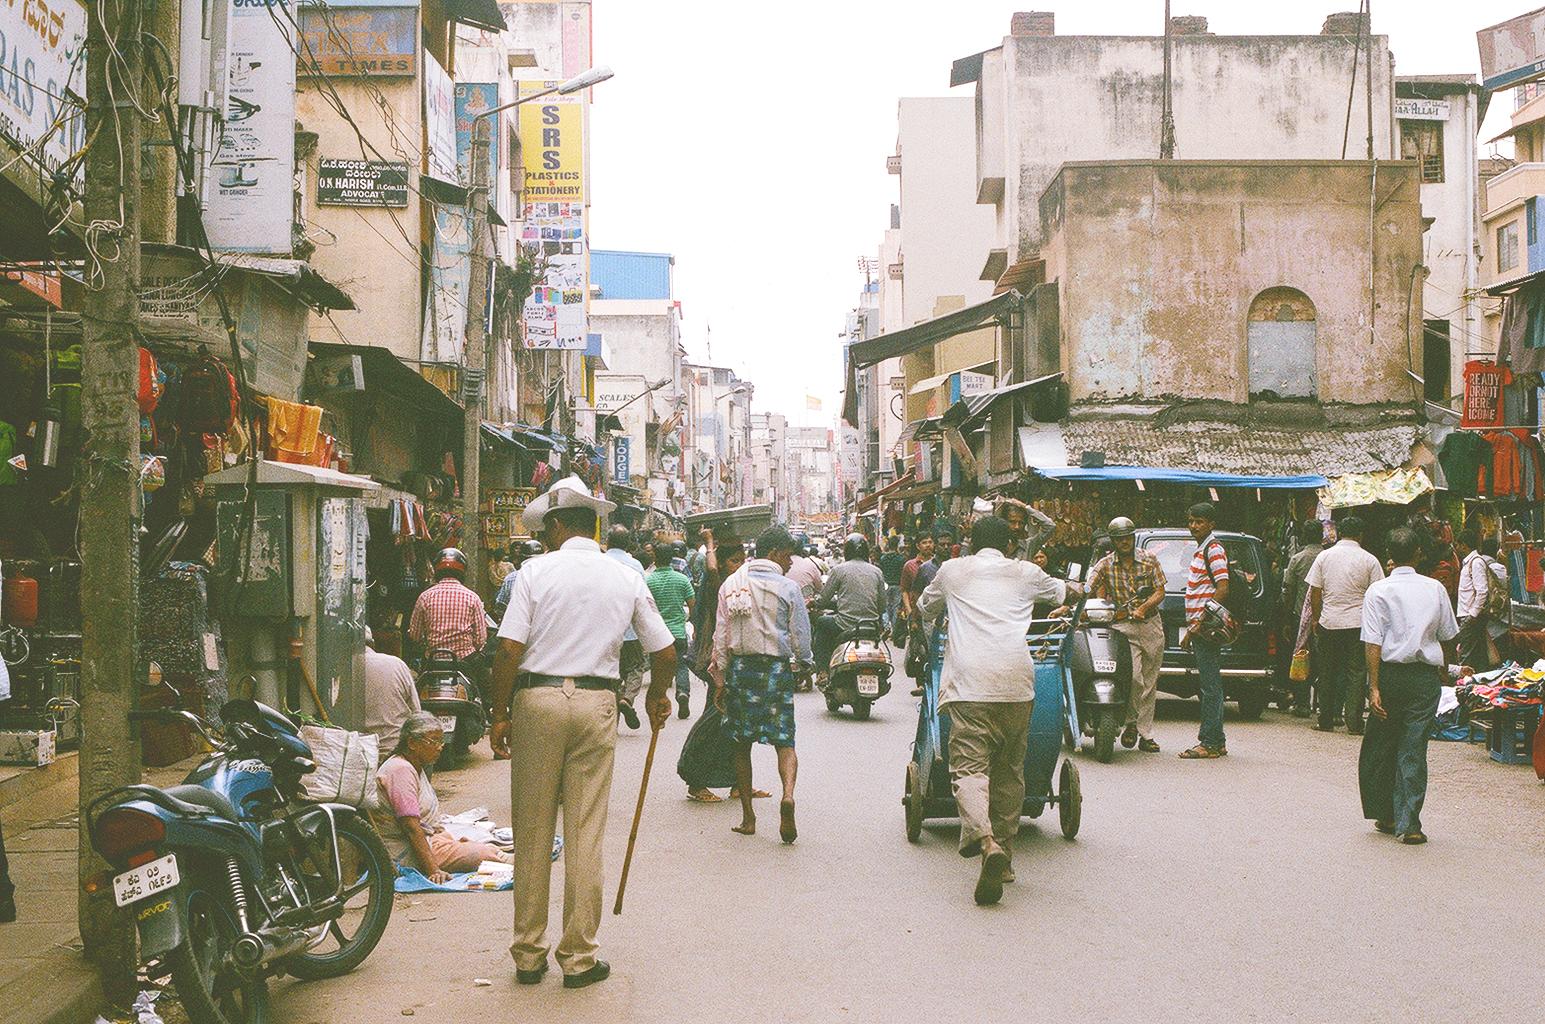 street-near-market.jpg